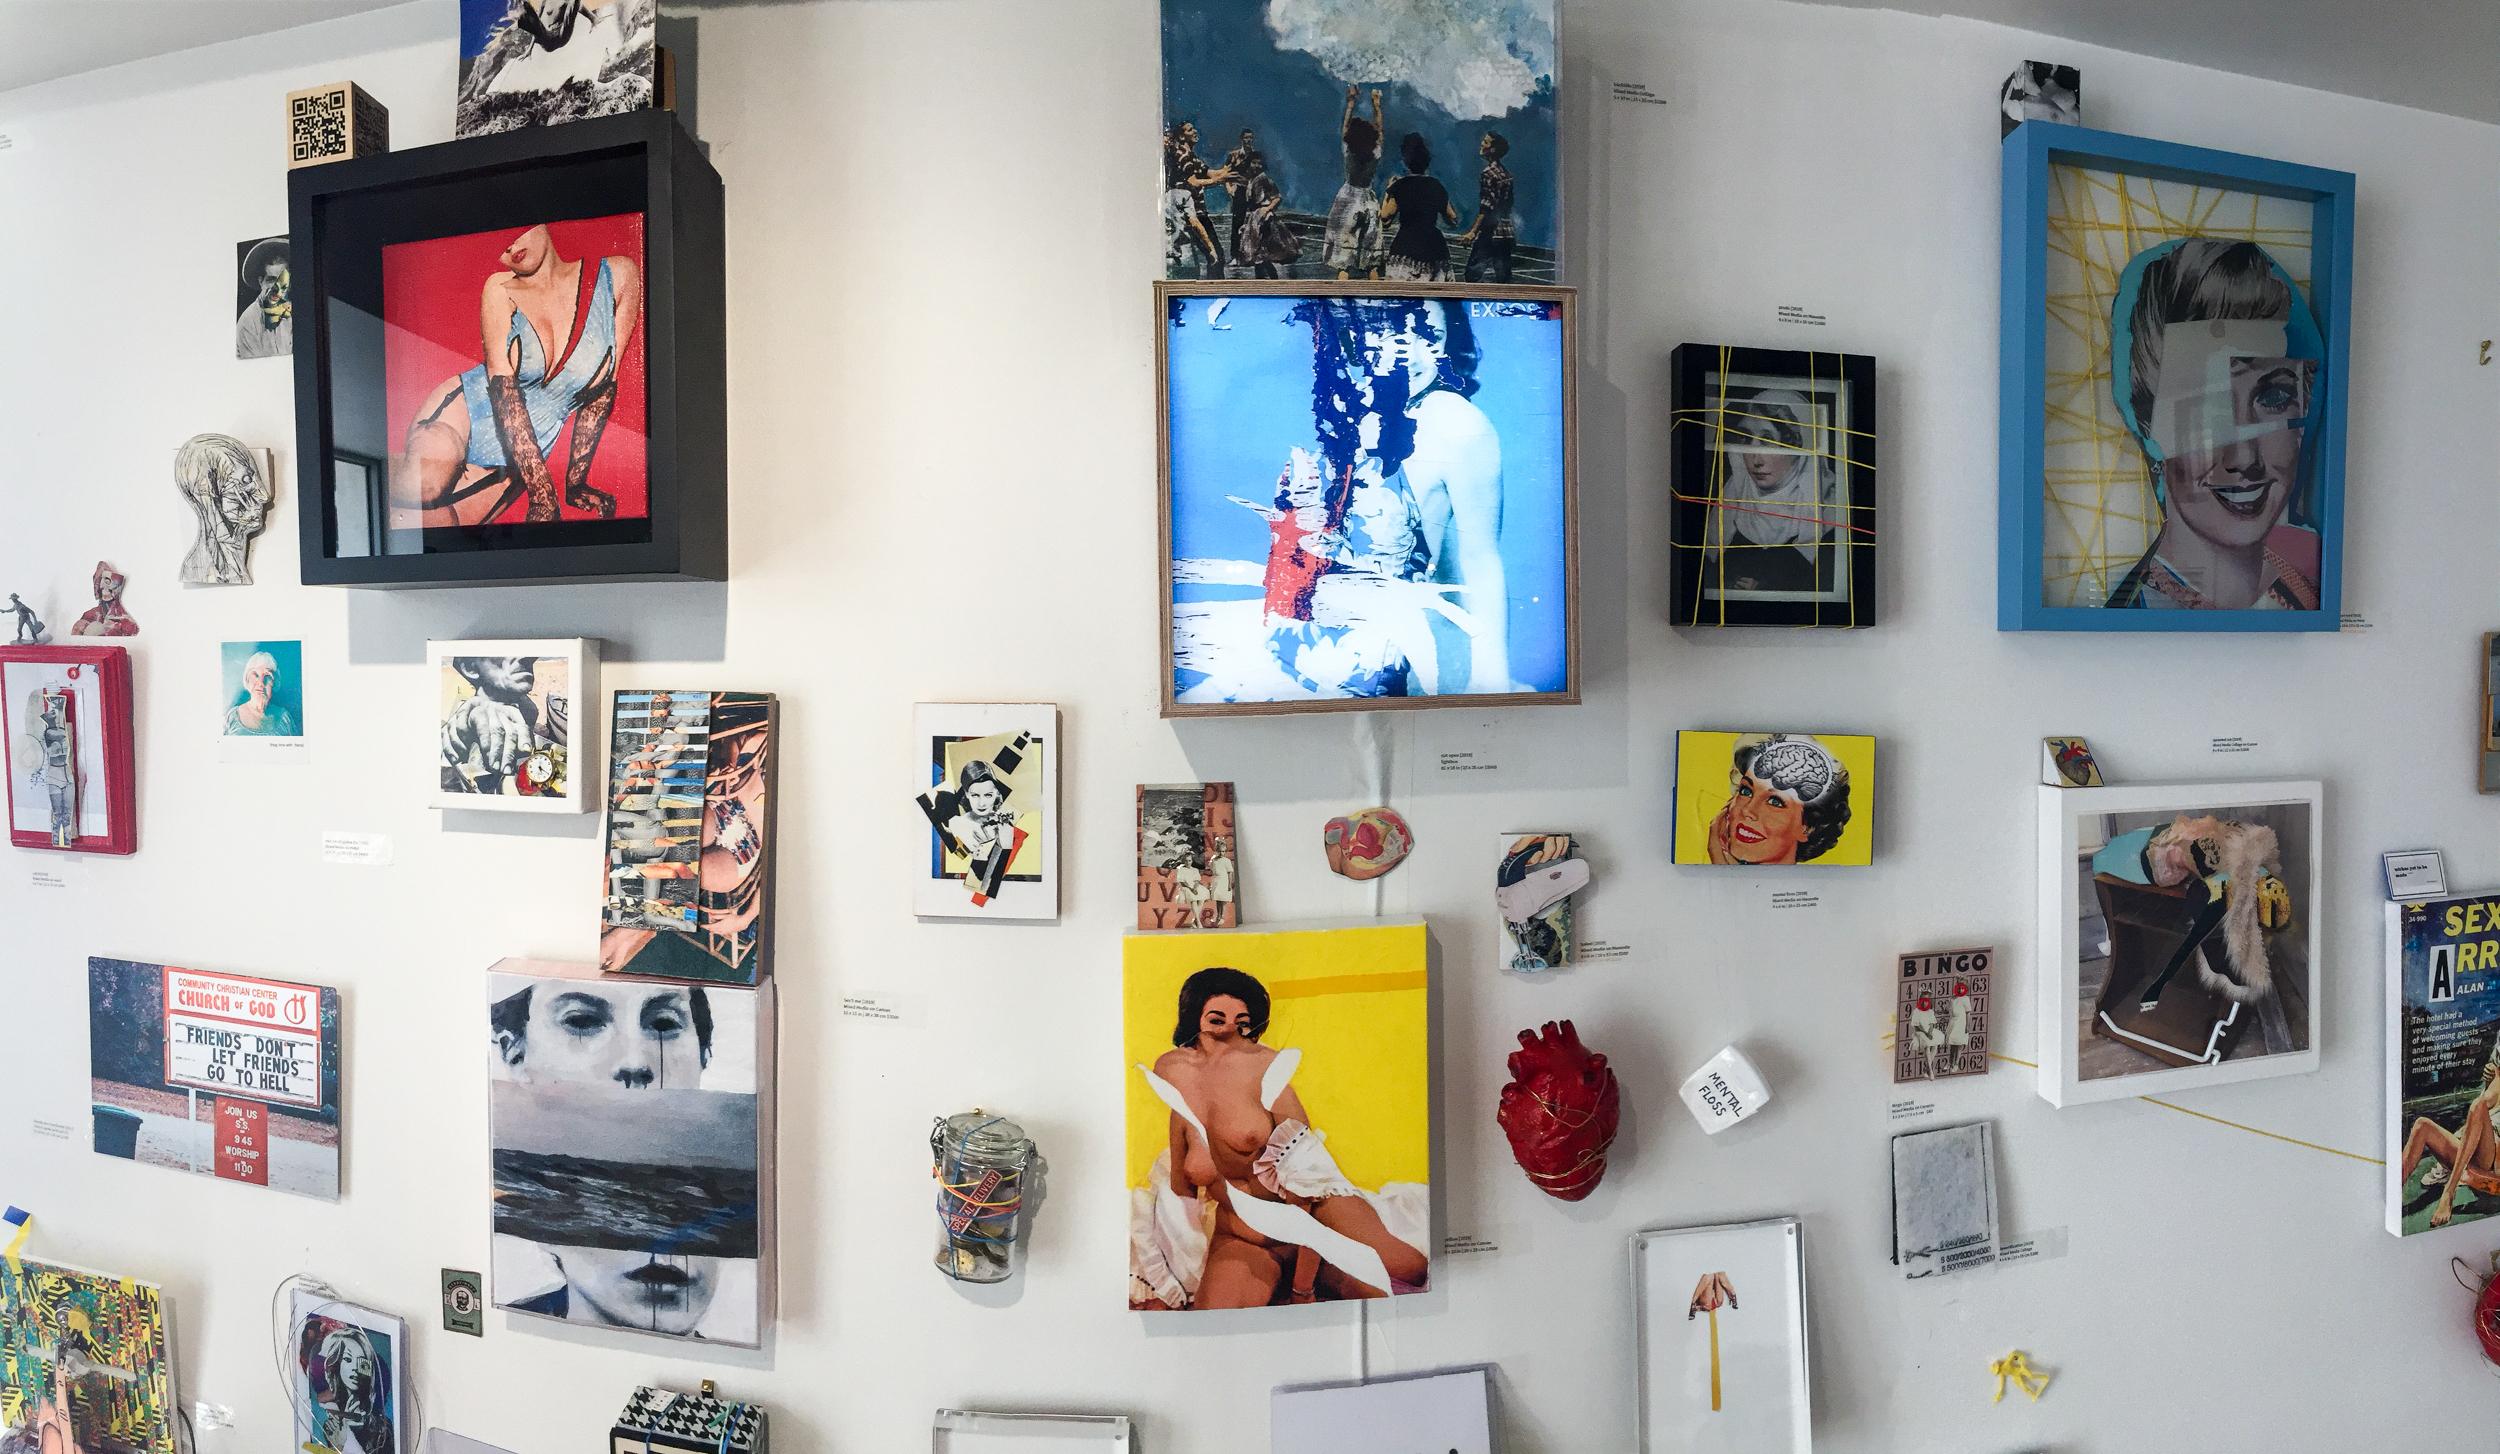 Faena-Exhibition-Images-129.jpg